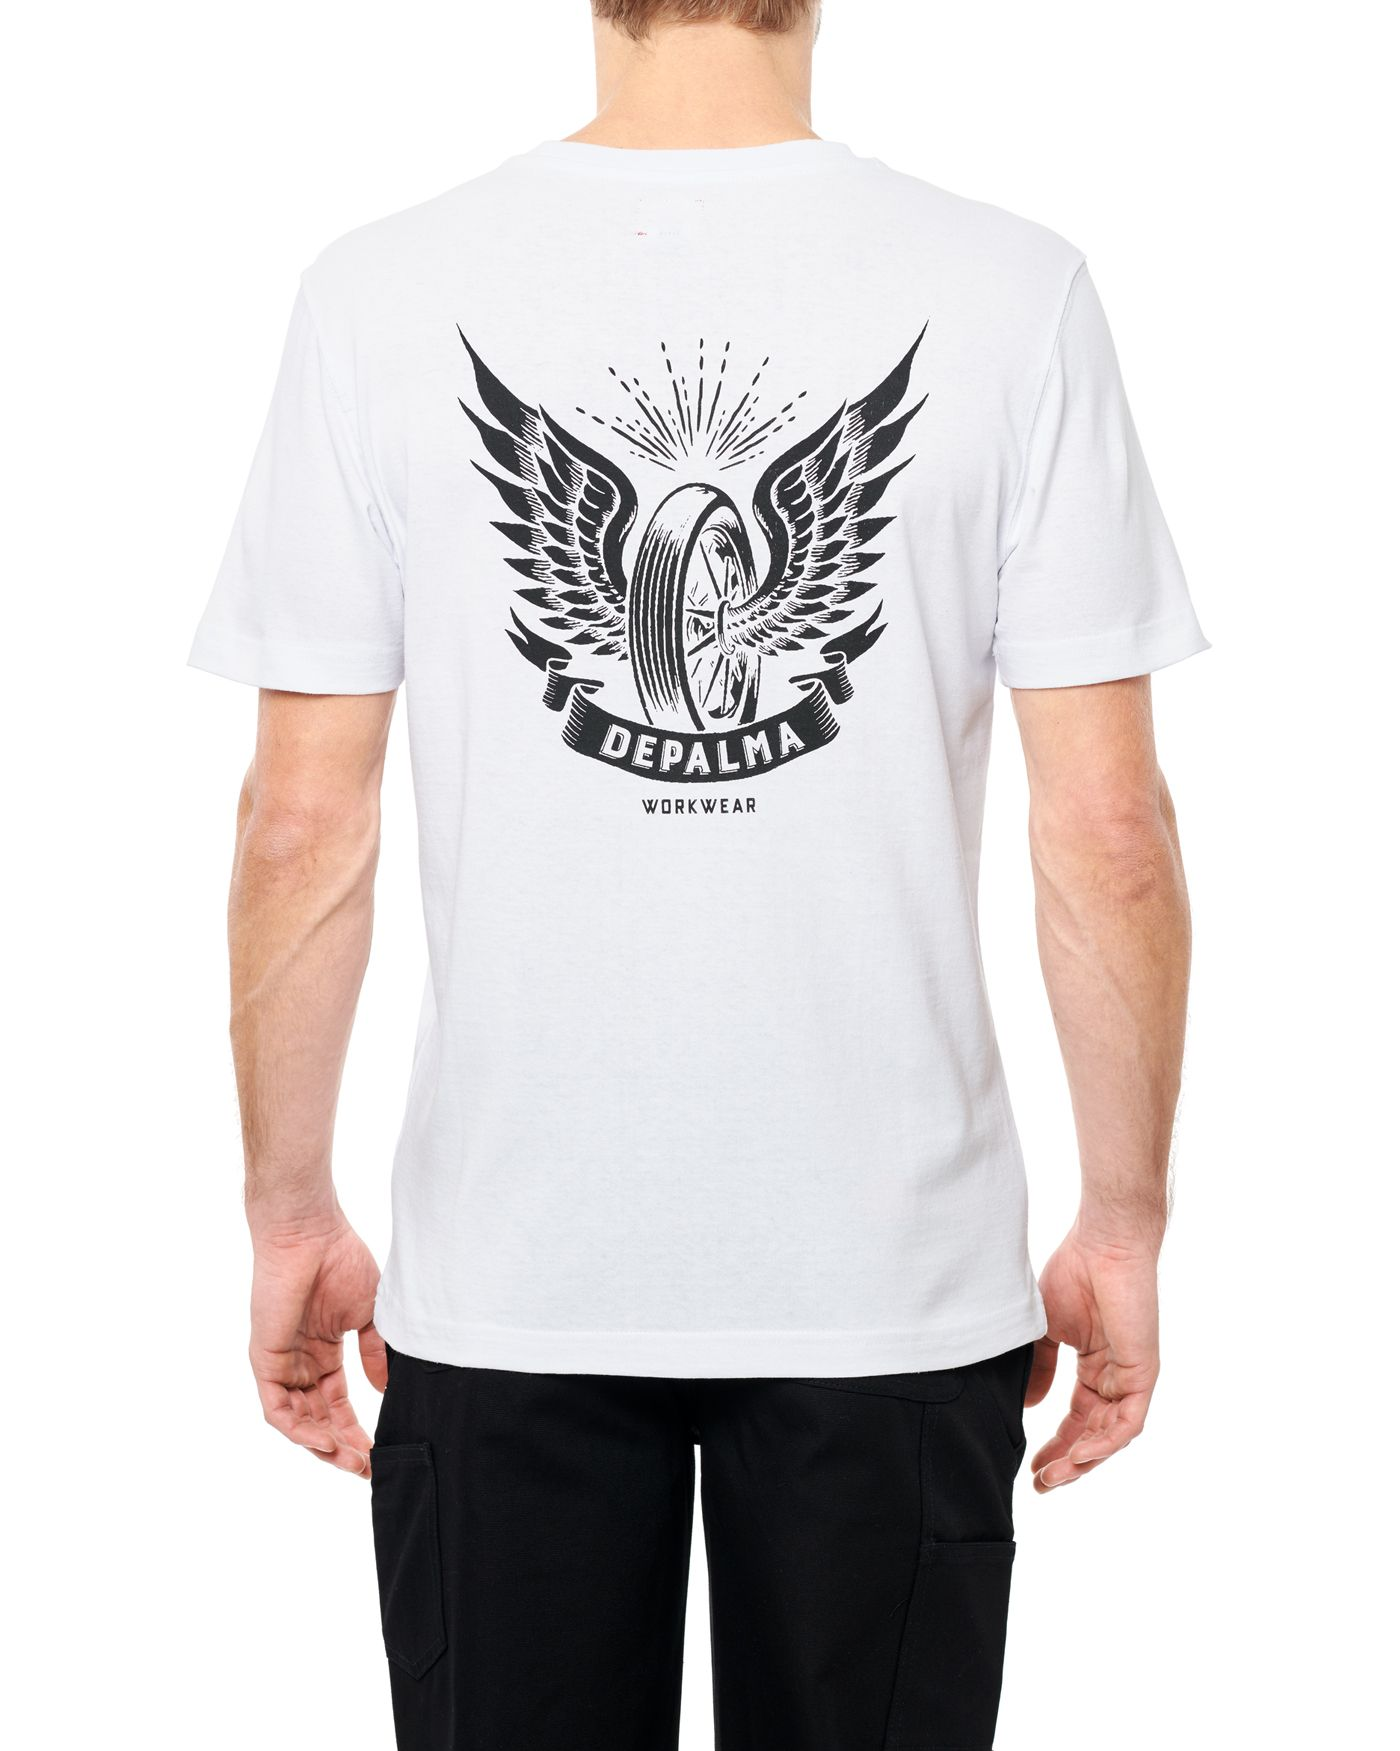 Photo of Thunder Road S/S T-shirt, White